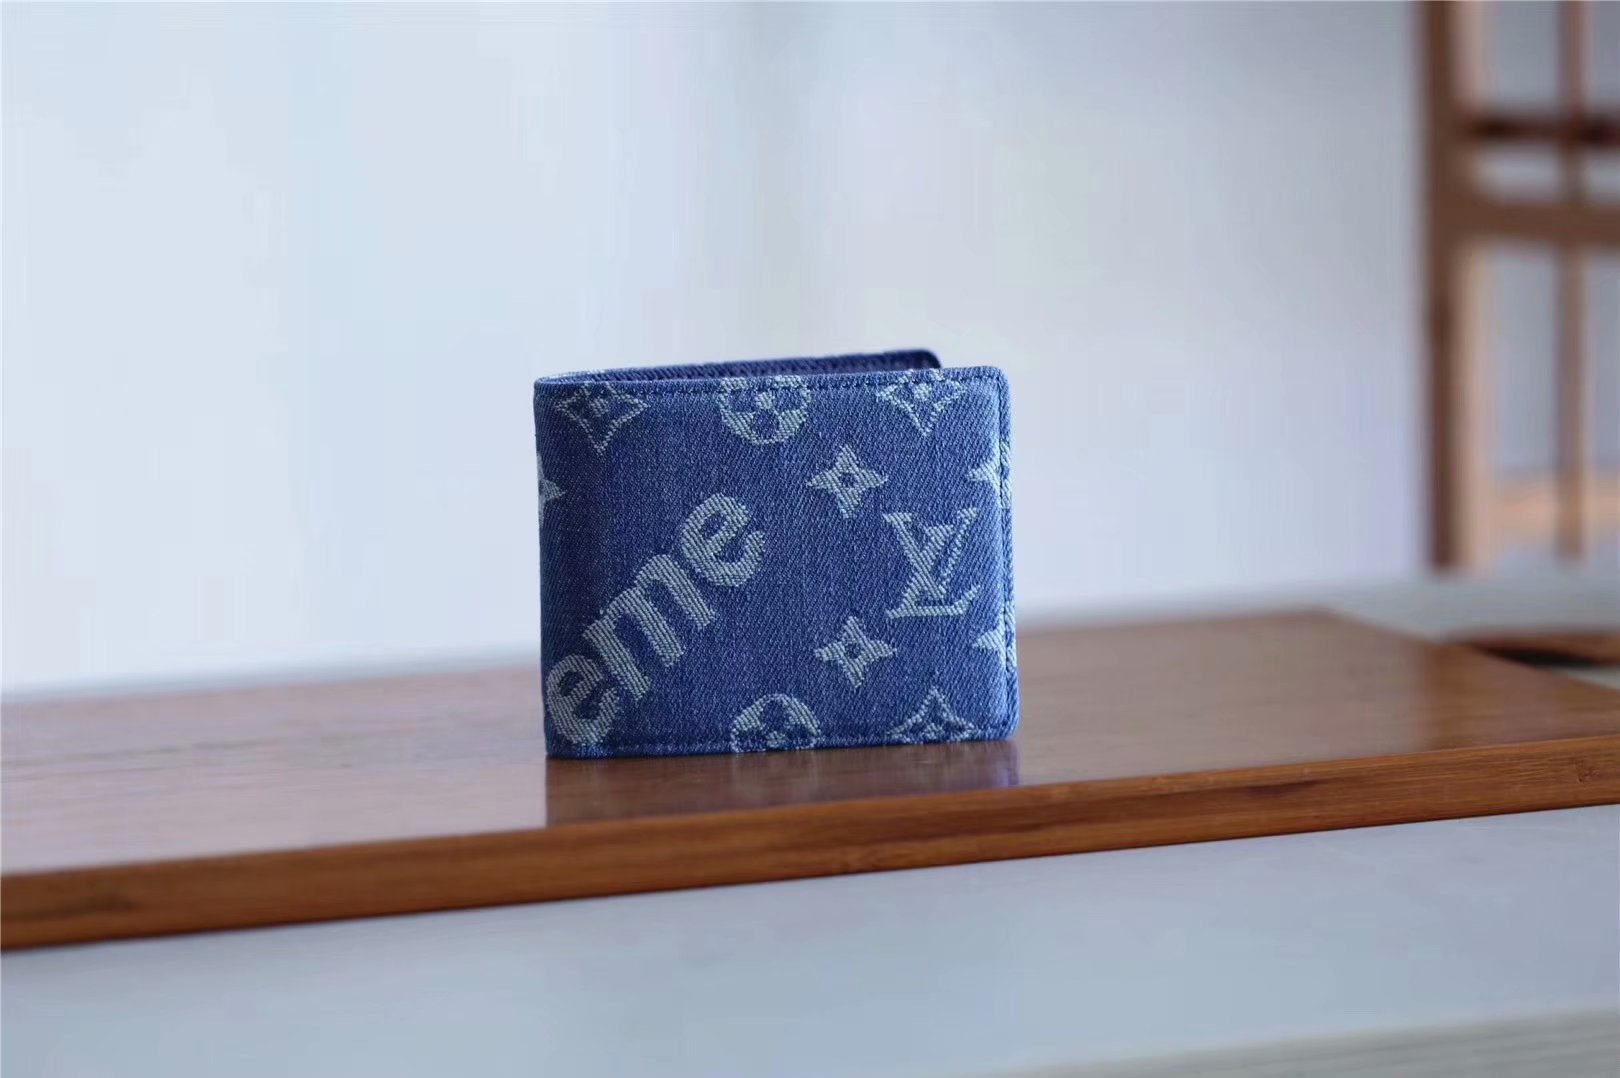 Replica Louis Vuitton M60895 Supreme Men Wallet Blue Denim